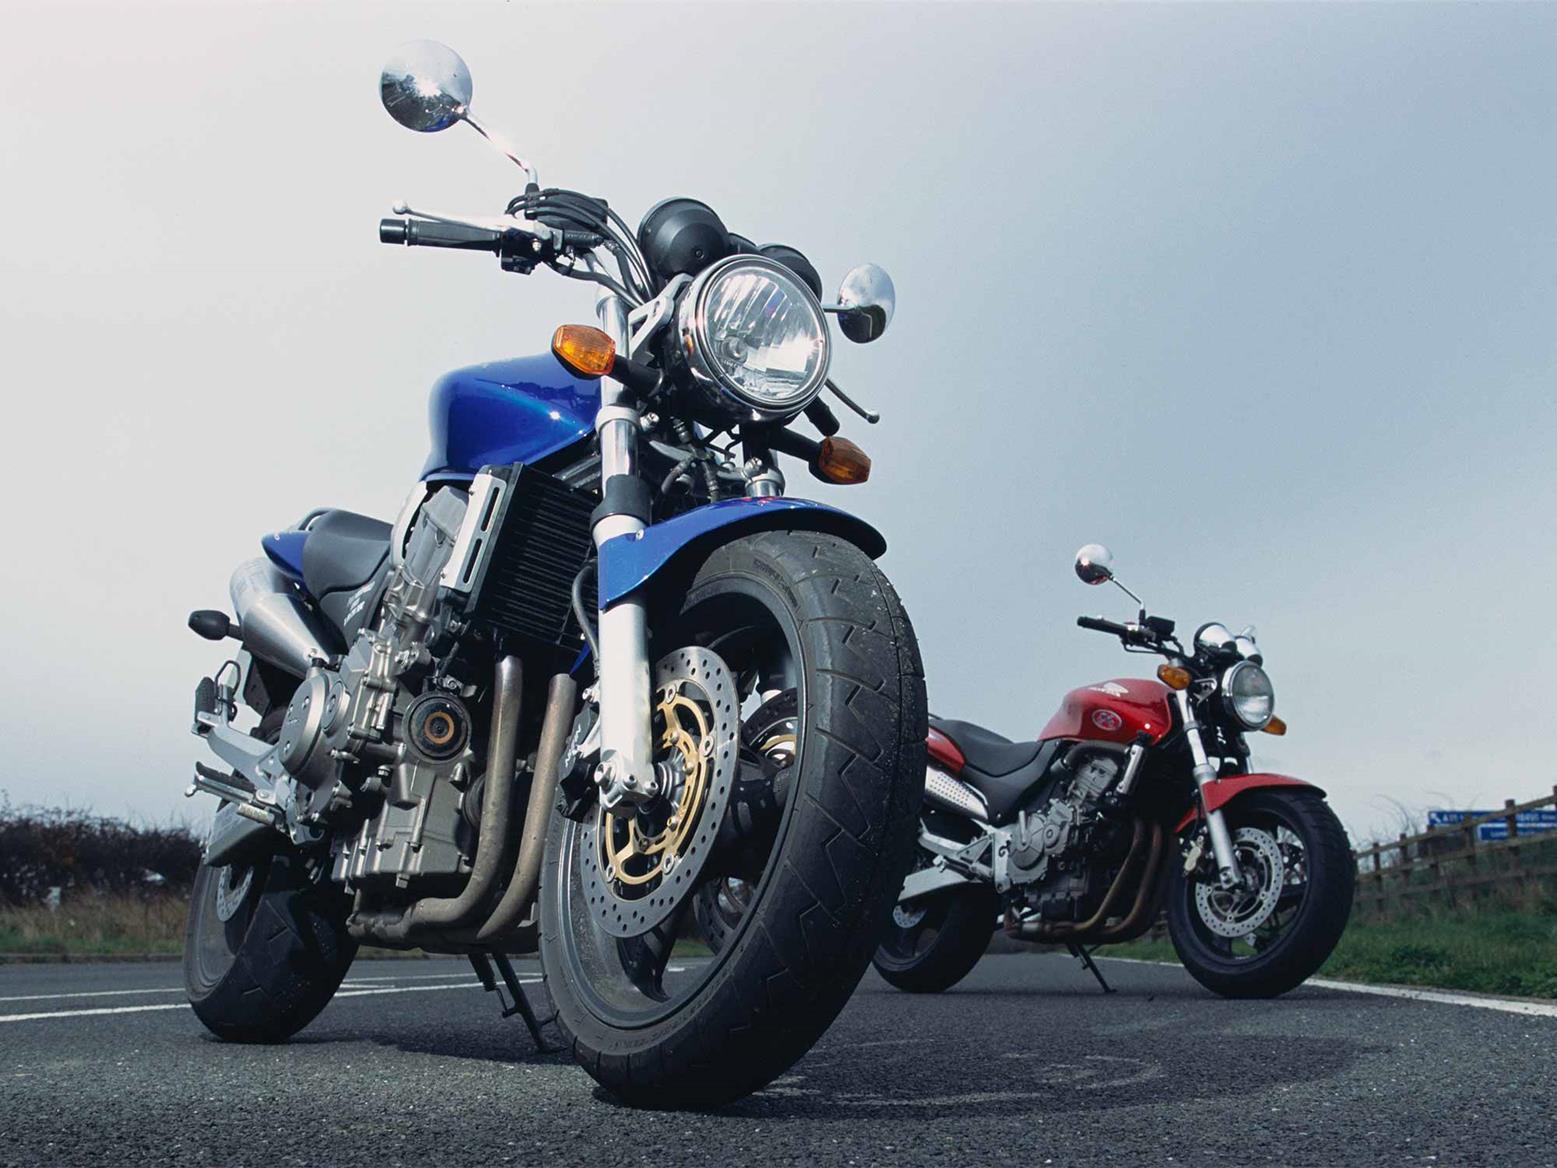 The Honda CB600F and CB900F Hornets